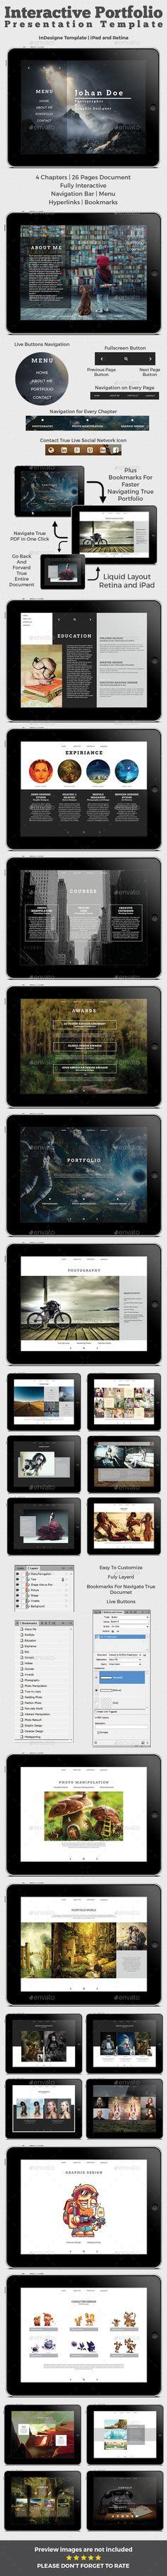 Interactive Portfolio Prezentation Tempalte #design Download: http://graphicriver.net/item/interactive-portfolio-prezentation/12862947?ref=ksioks